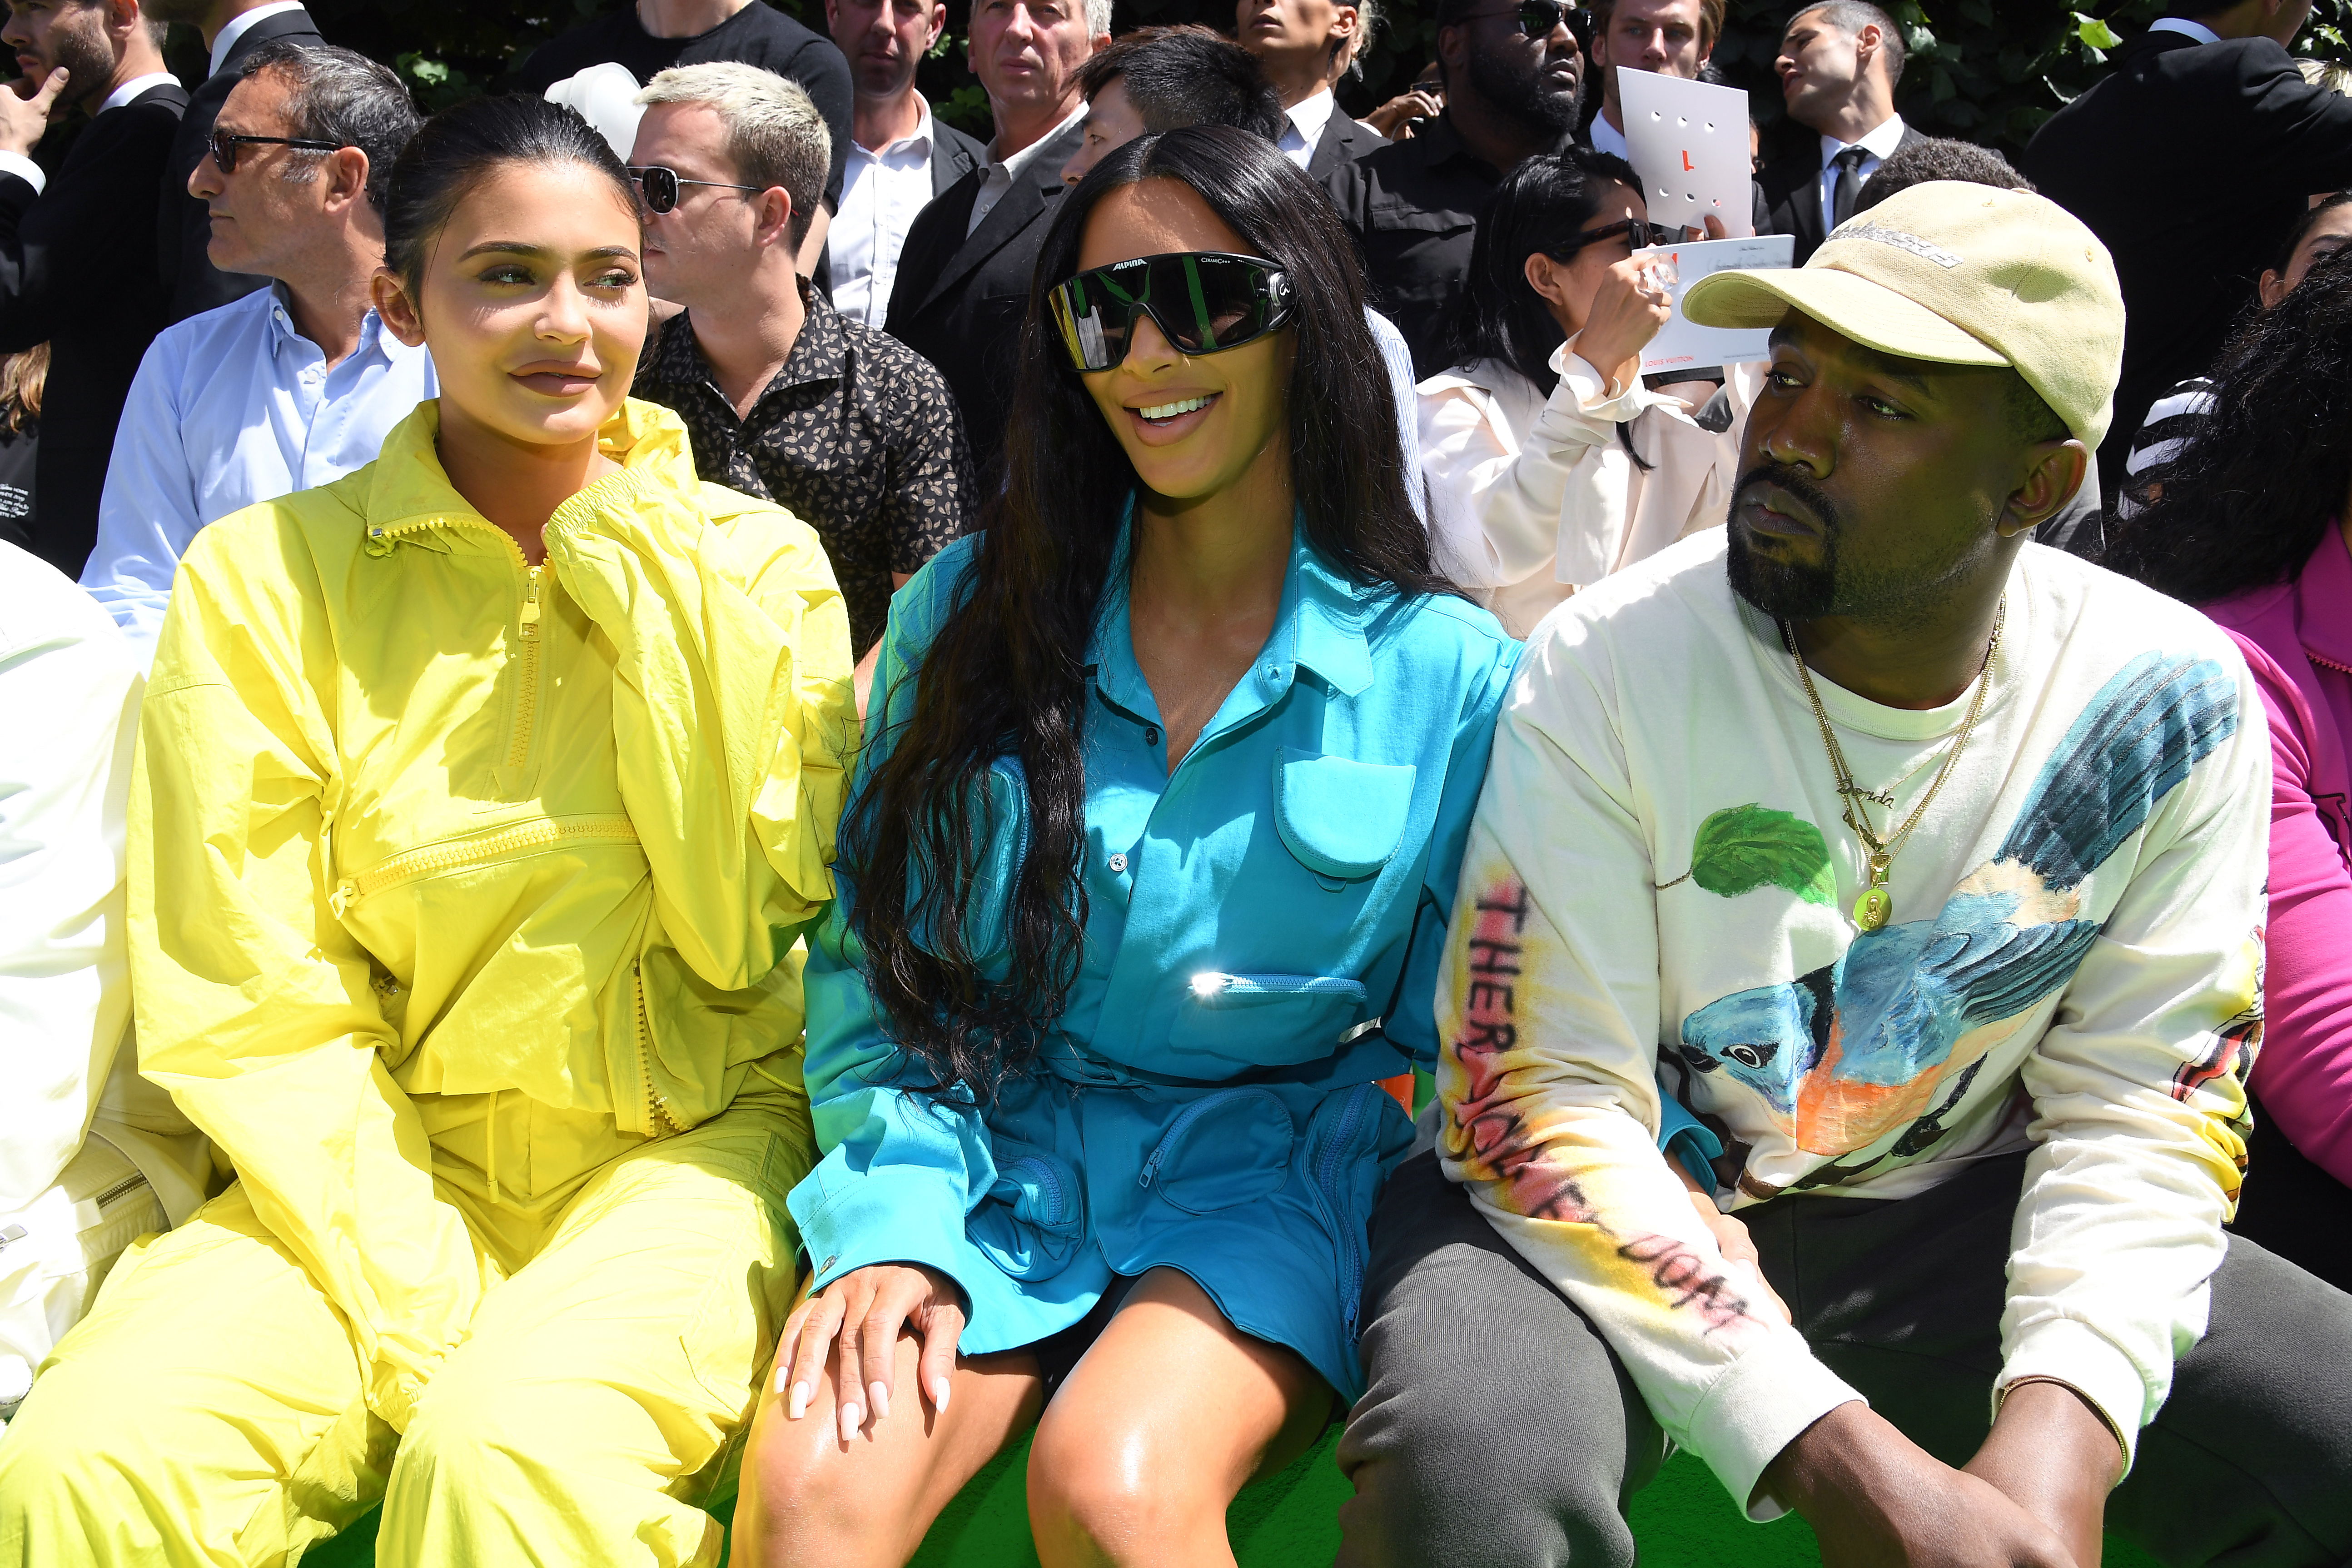 Kylie Jenner, Kim Kardashian, Kanye West